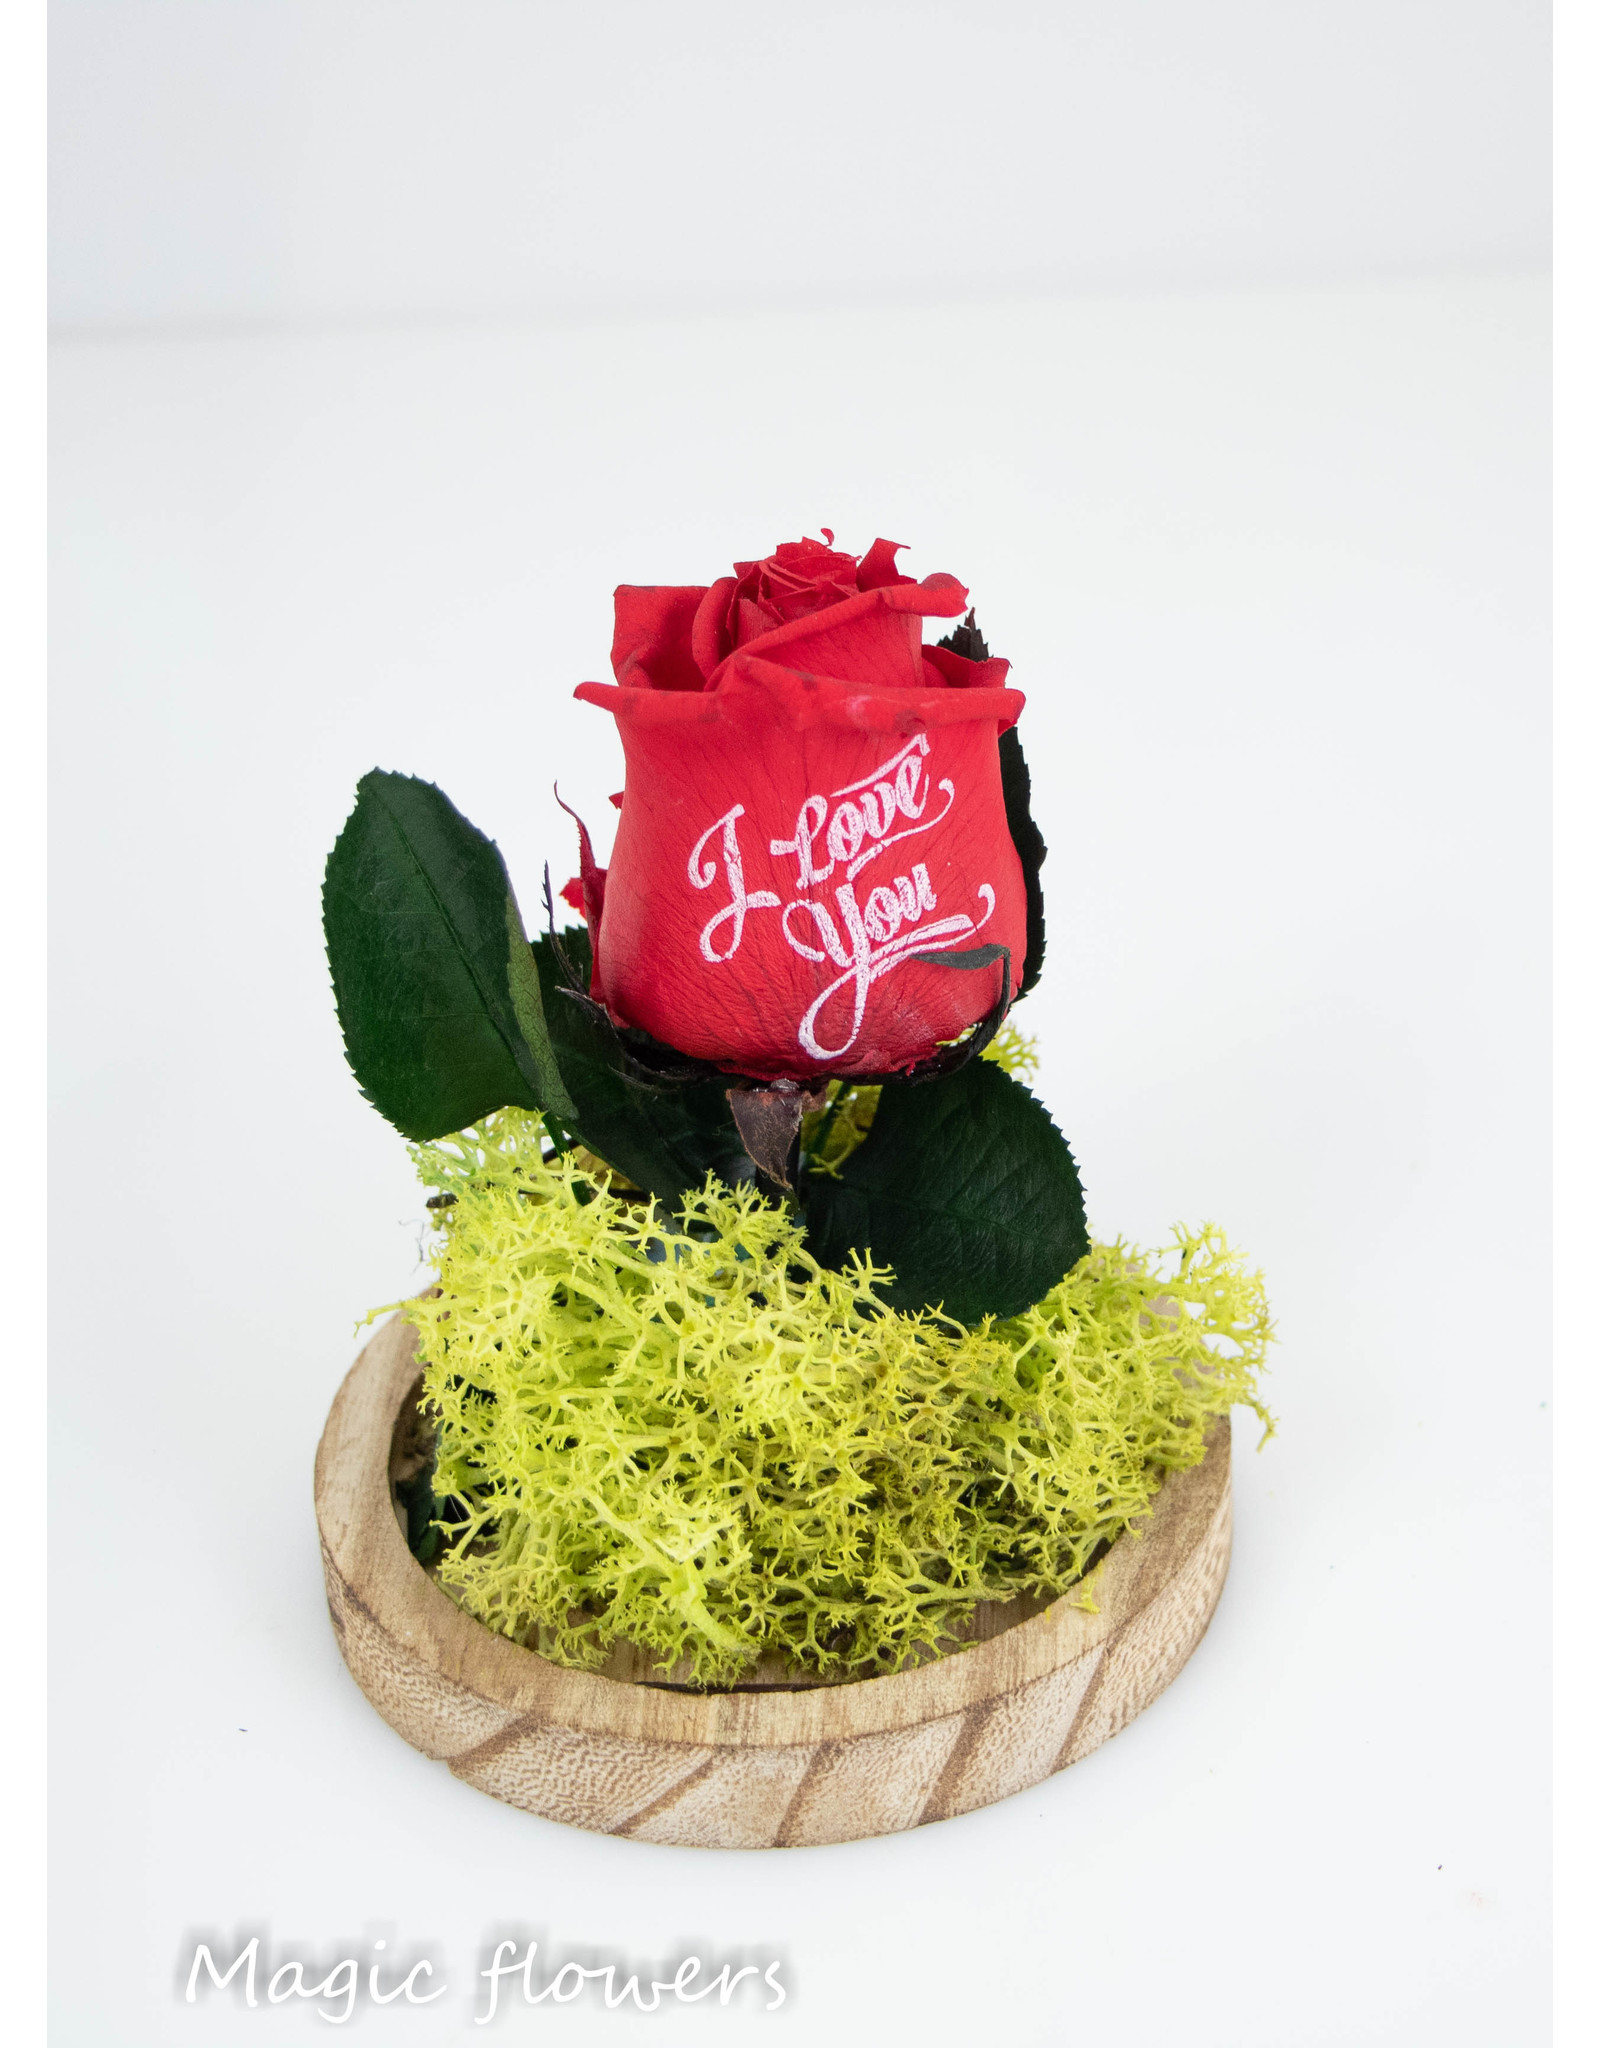 Valentine special rose - I love you